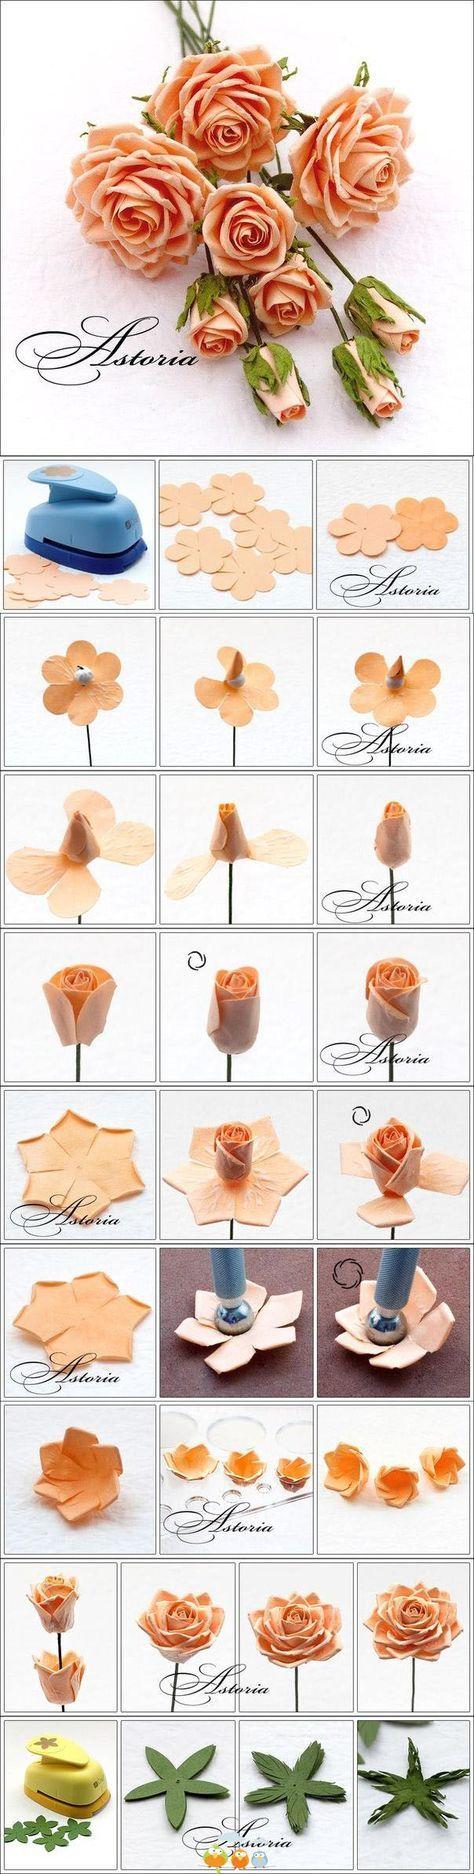 DIY Paper Flowers#roses# bouquet#crafts#home made#easy#idea#do it yourself#project #handmade#cool#gift#decor#wedding favour# +++LINDAS FLORES DE PAPEL ROSAS RAMO MANUALIDAD REGALO DECORACION